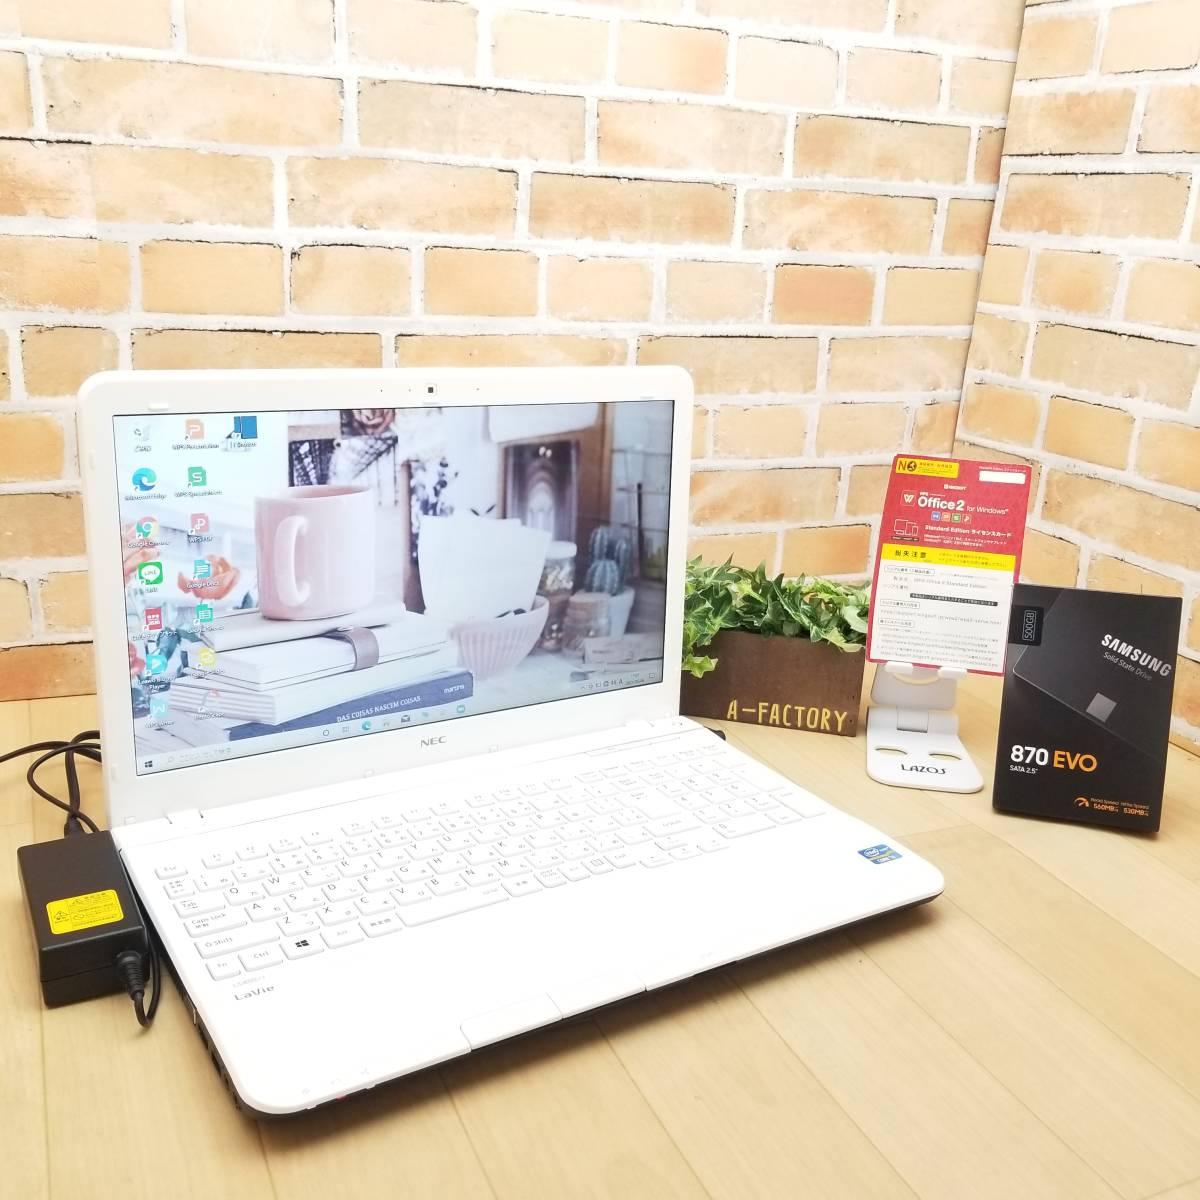 ★美品★国内正規新品SSD500GB/高性能第3世代i3搭載/メモリ8GB/無線 Wi-Fi/Win10/Webカメラ/最新Office/Lavie LS450/J(C7921)_★新品SSD 500GB Samsung 870 EVO搭載★